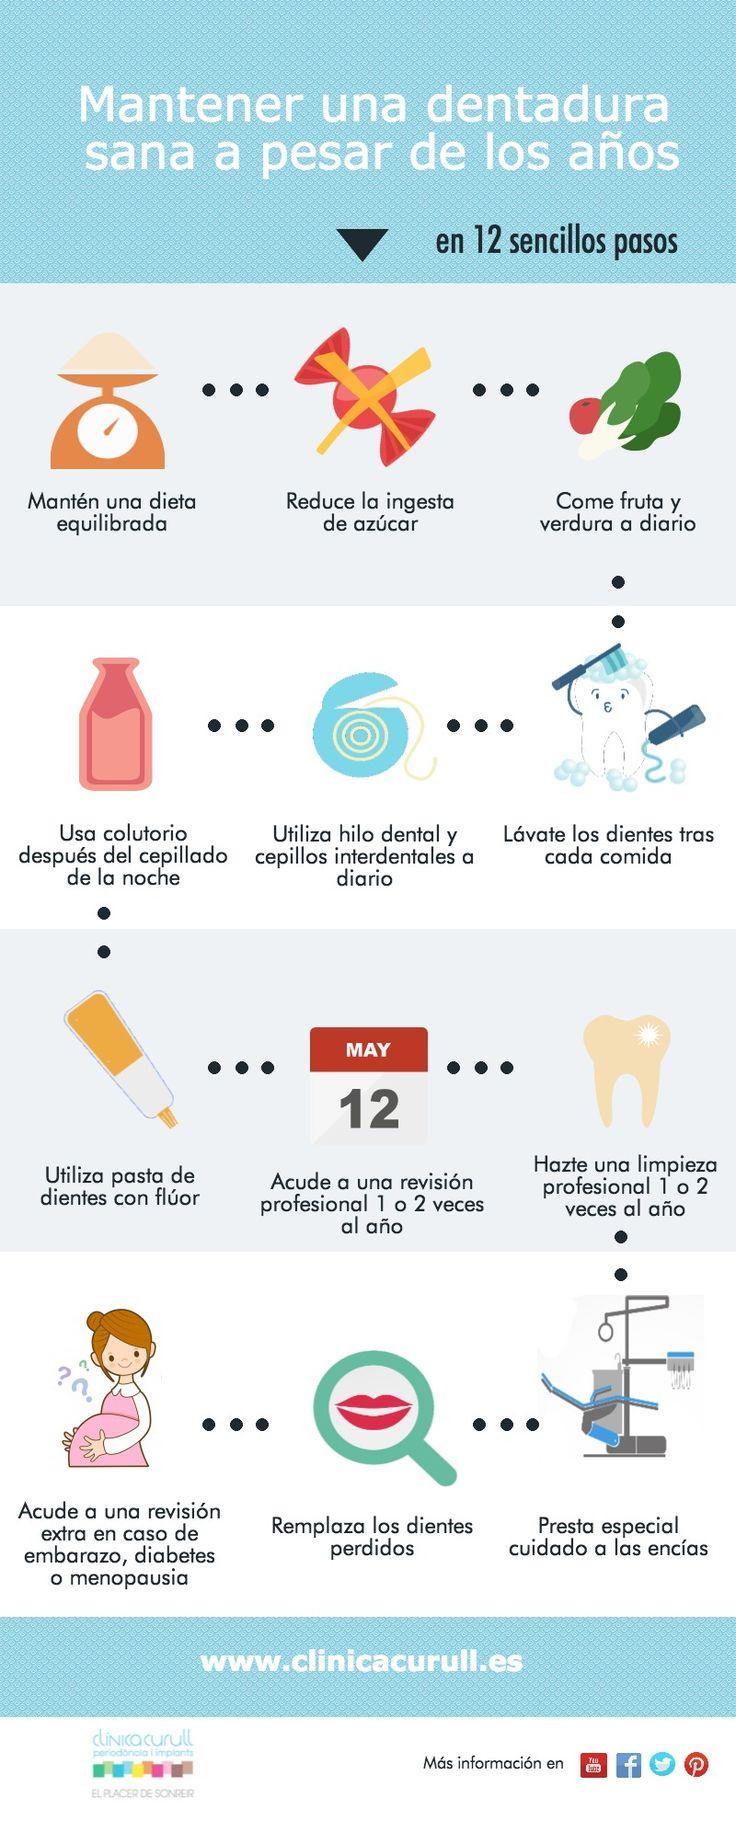 Consejos para mantener una dentadura sana.  #BocaSana #SaludBucal #EstéticaDental www.clinicacurull.com/